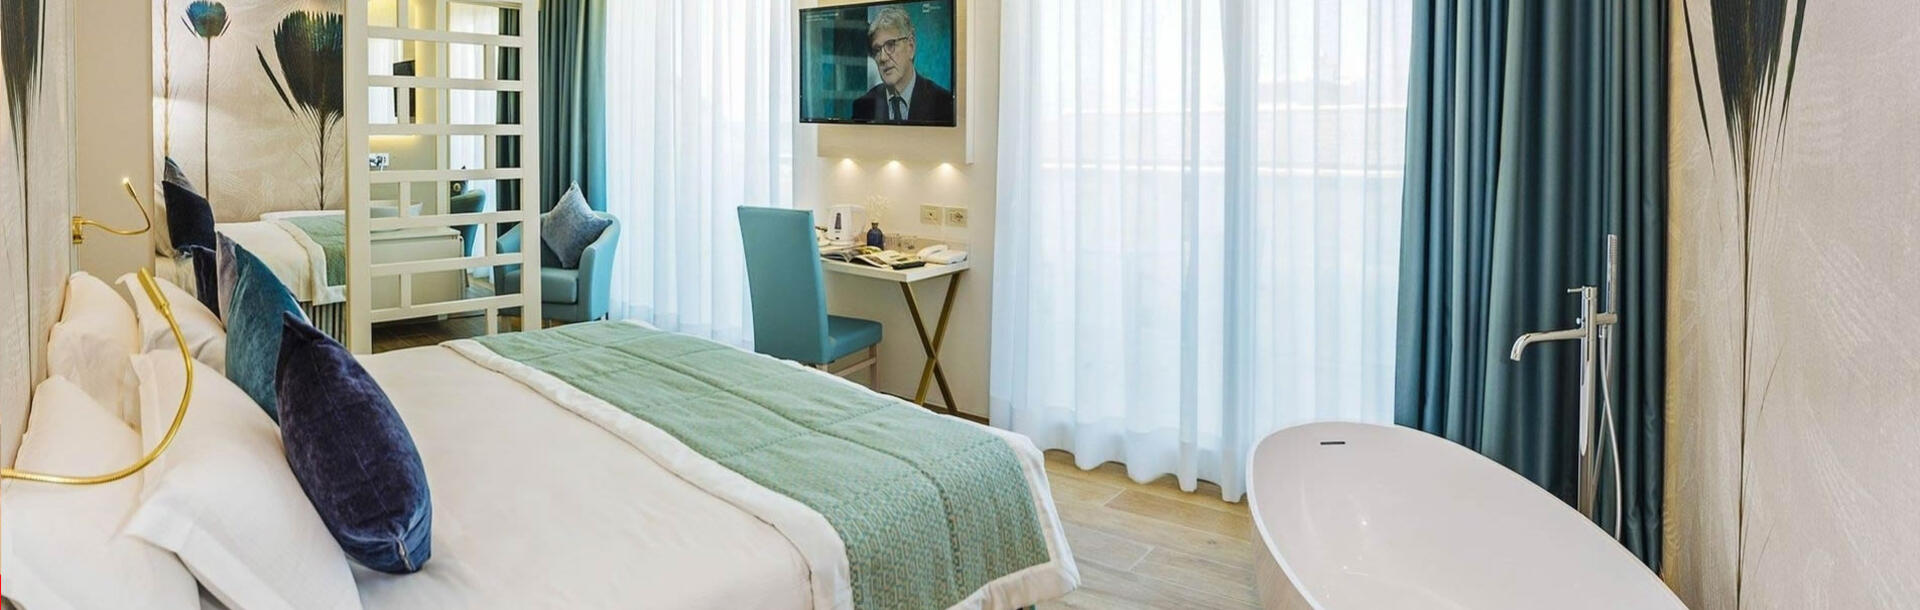 hotel-montecarlo de deluxe-living-suite-aparthotel-bibione 014